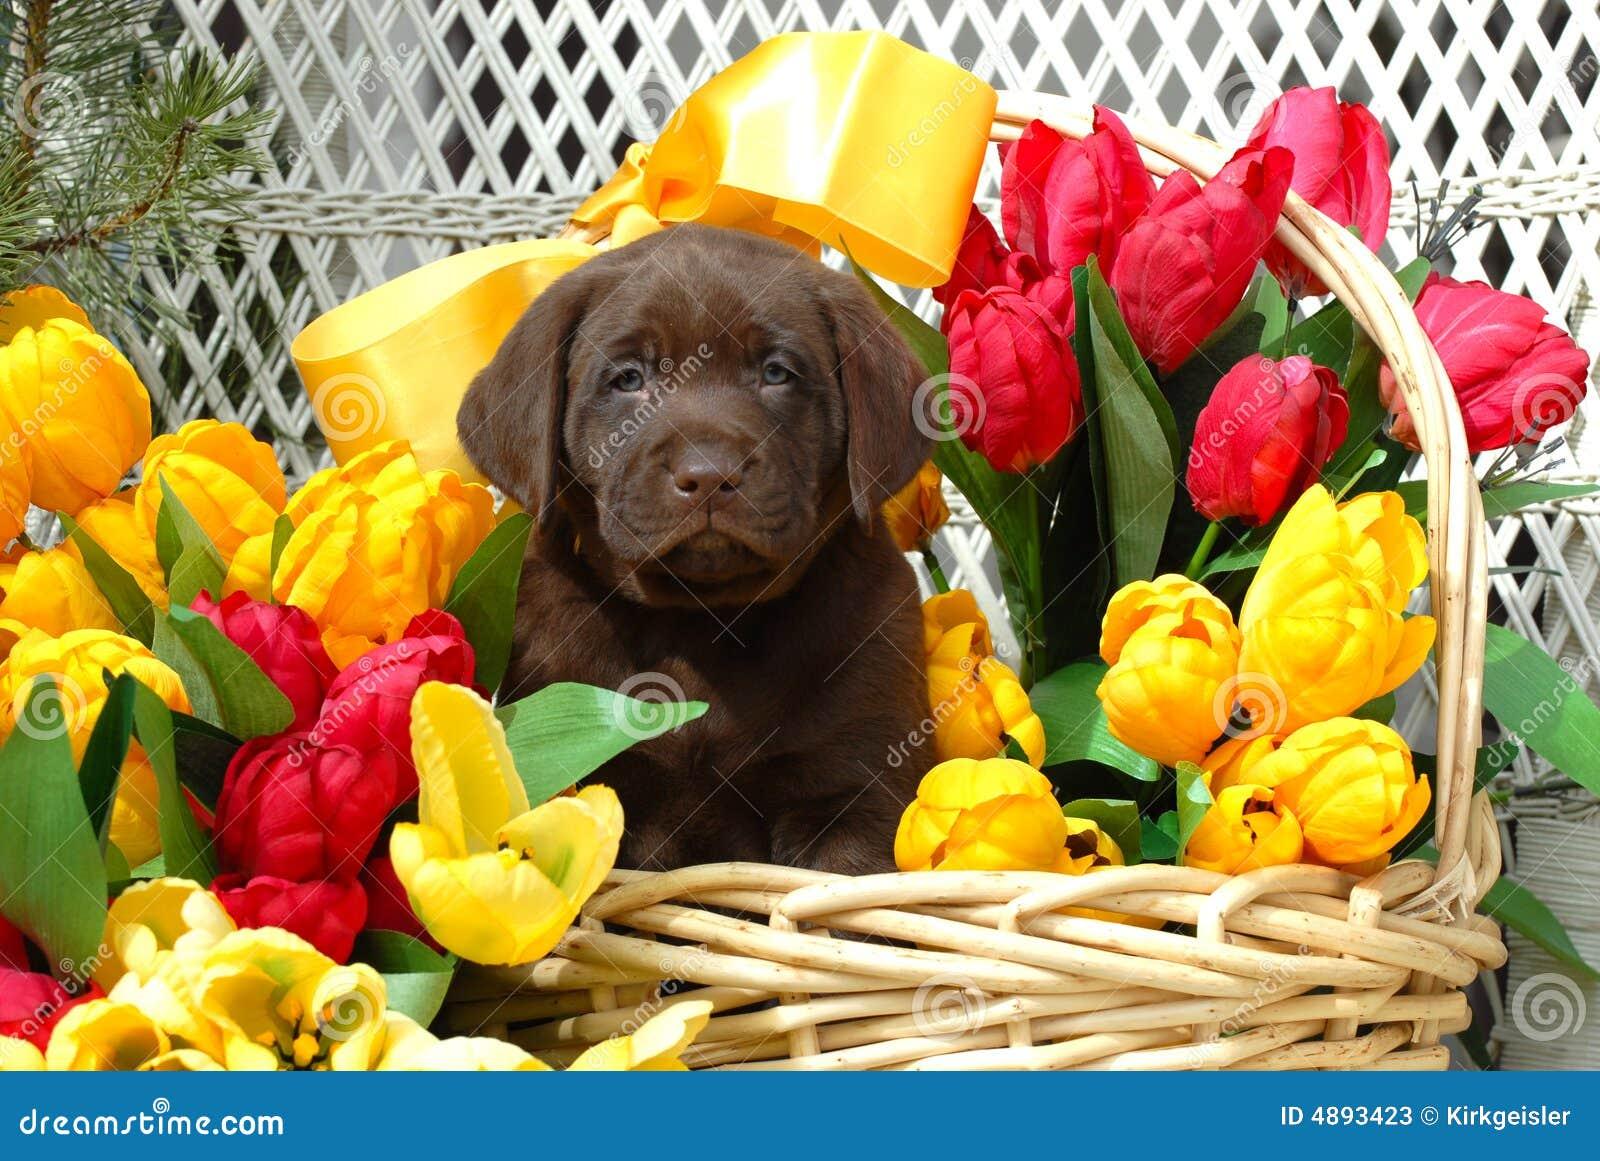 spring puppy stock photos image 4893423